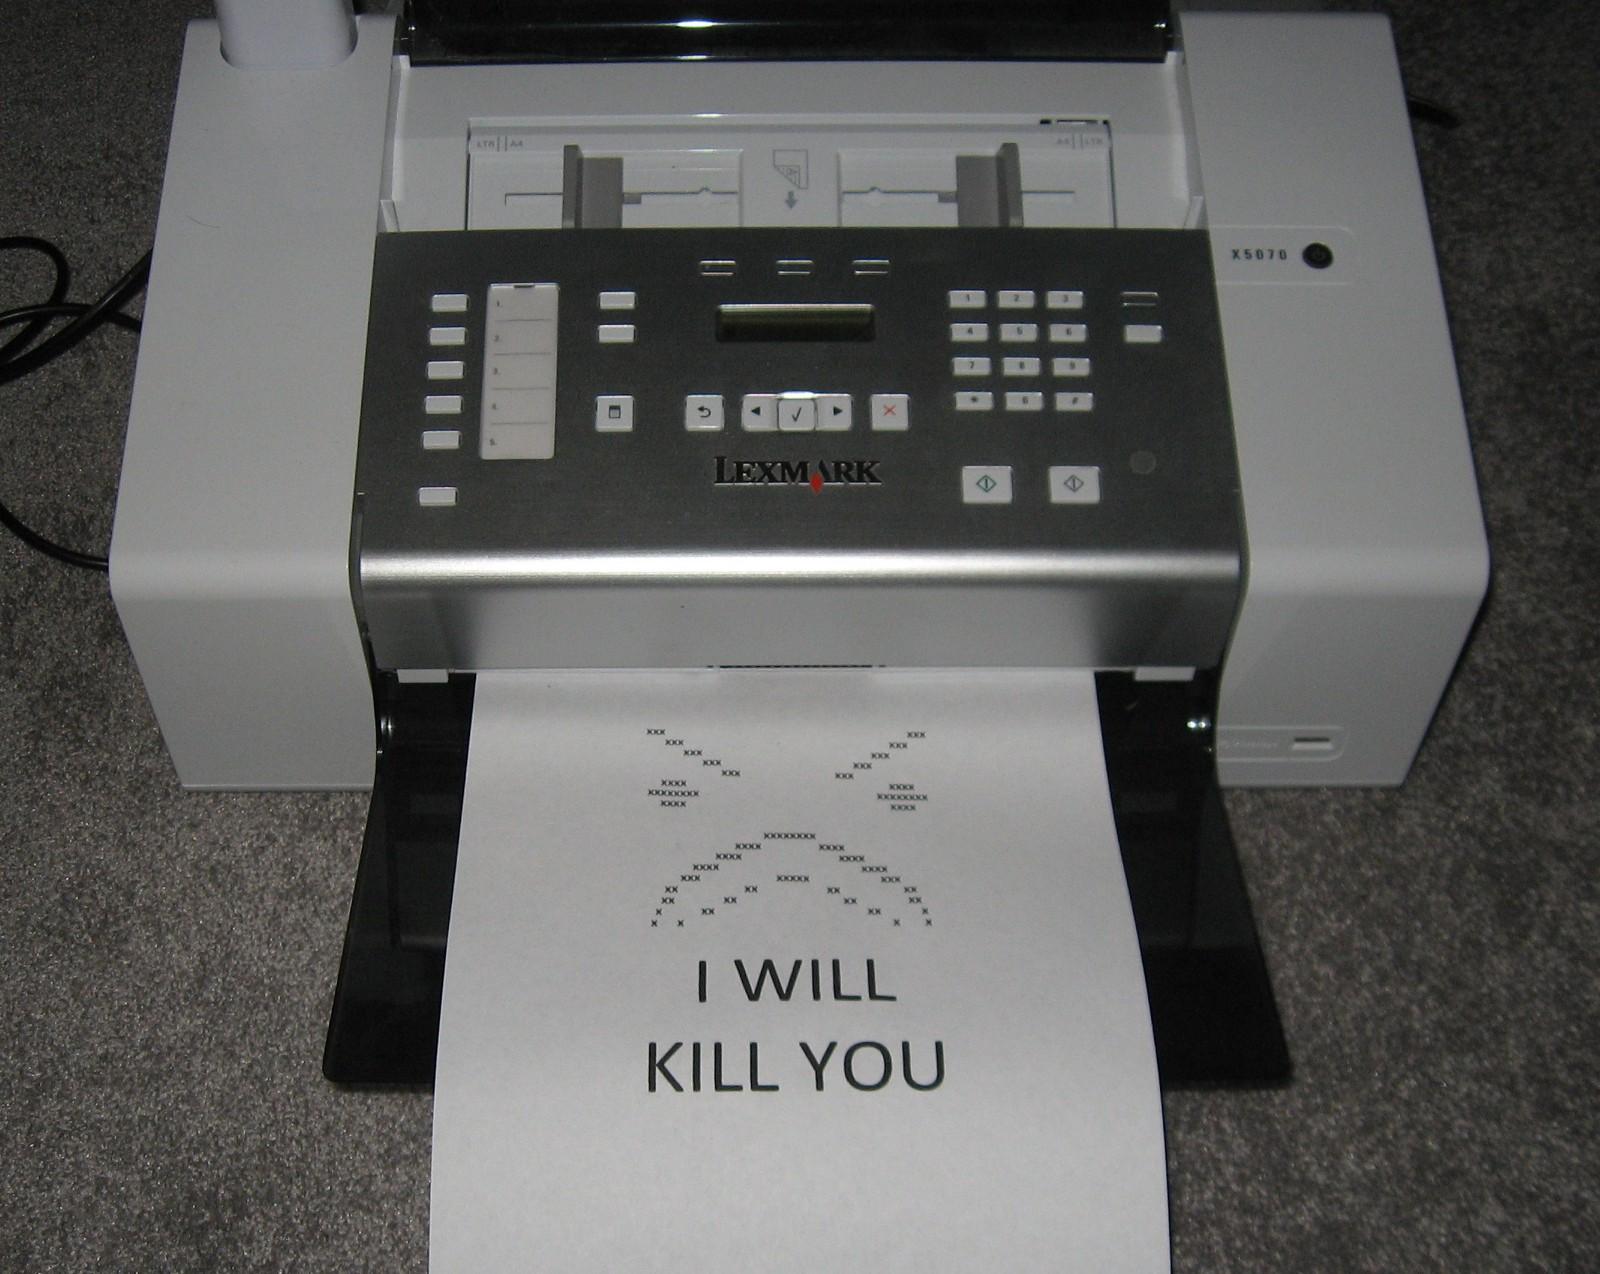 Riding the Printer Pwnie - By